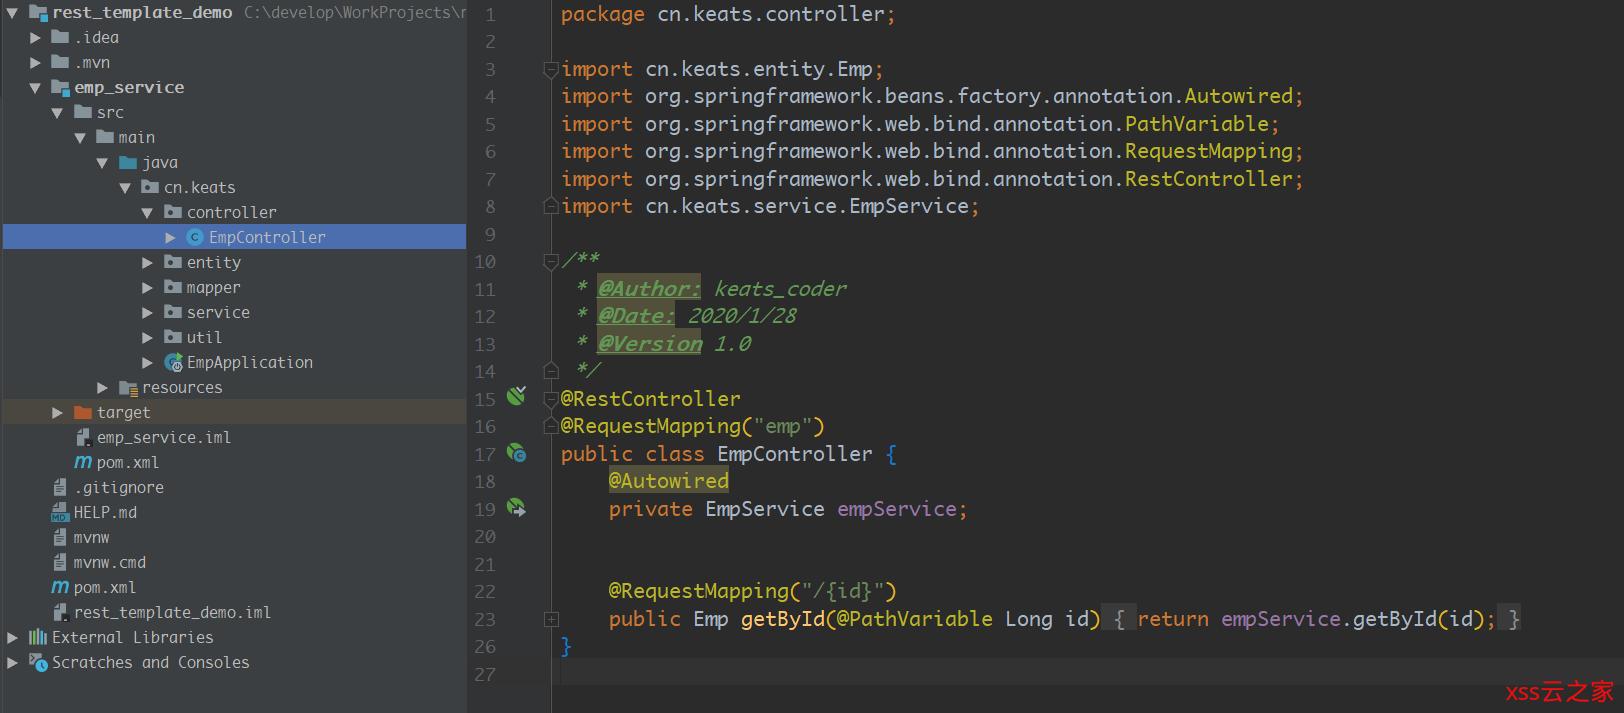 RestTemplate---Spring提供的轻量Http Rest 风格API调用工具